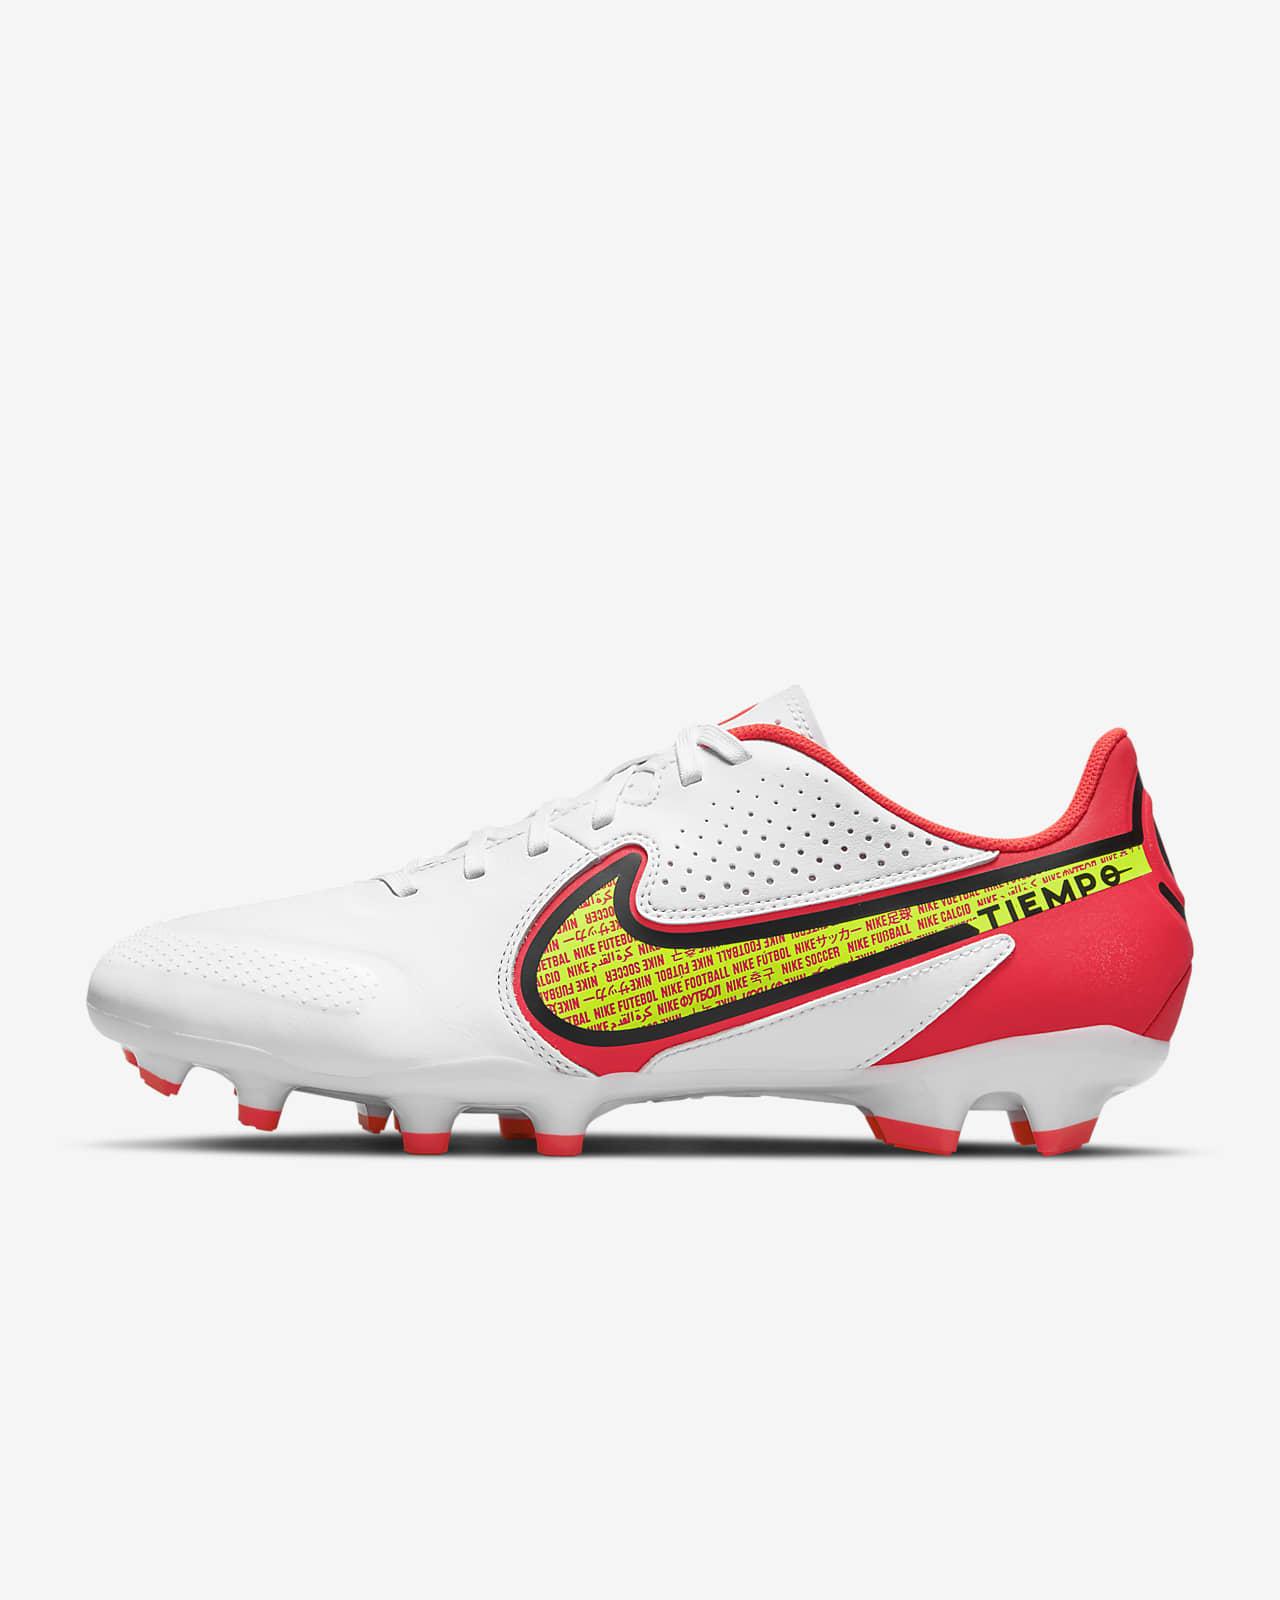 Nike Legend 9 Academy FG/MG 男/女多种场地足球鞋